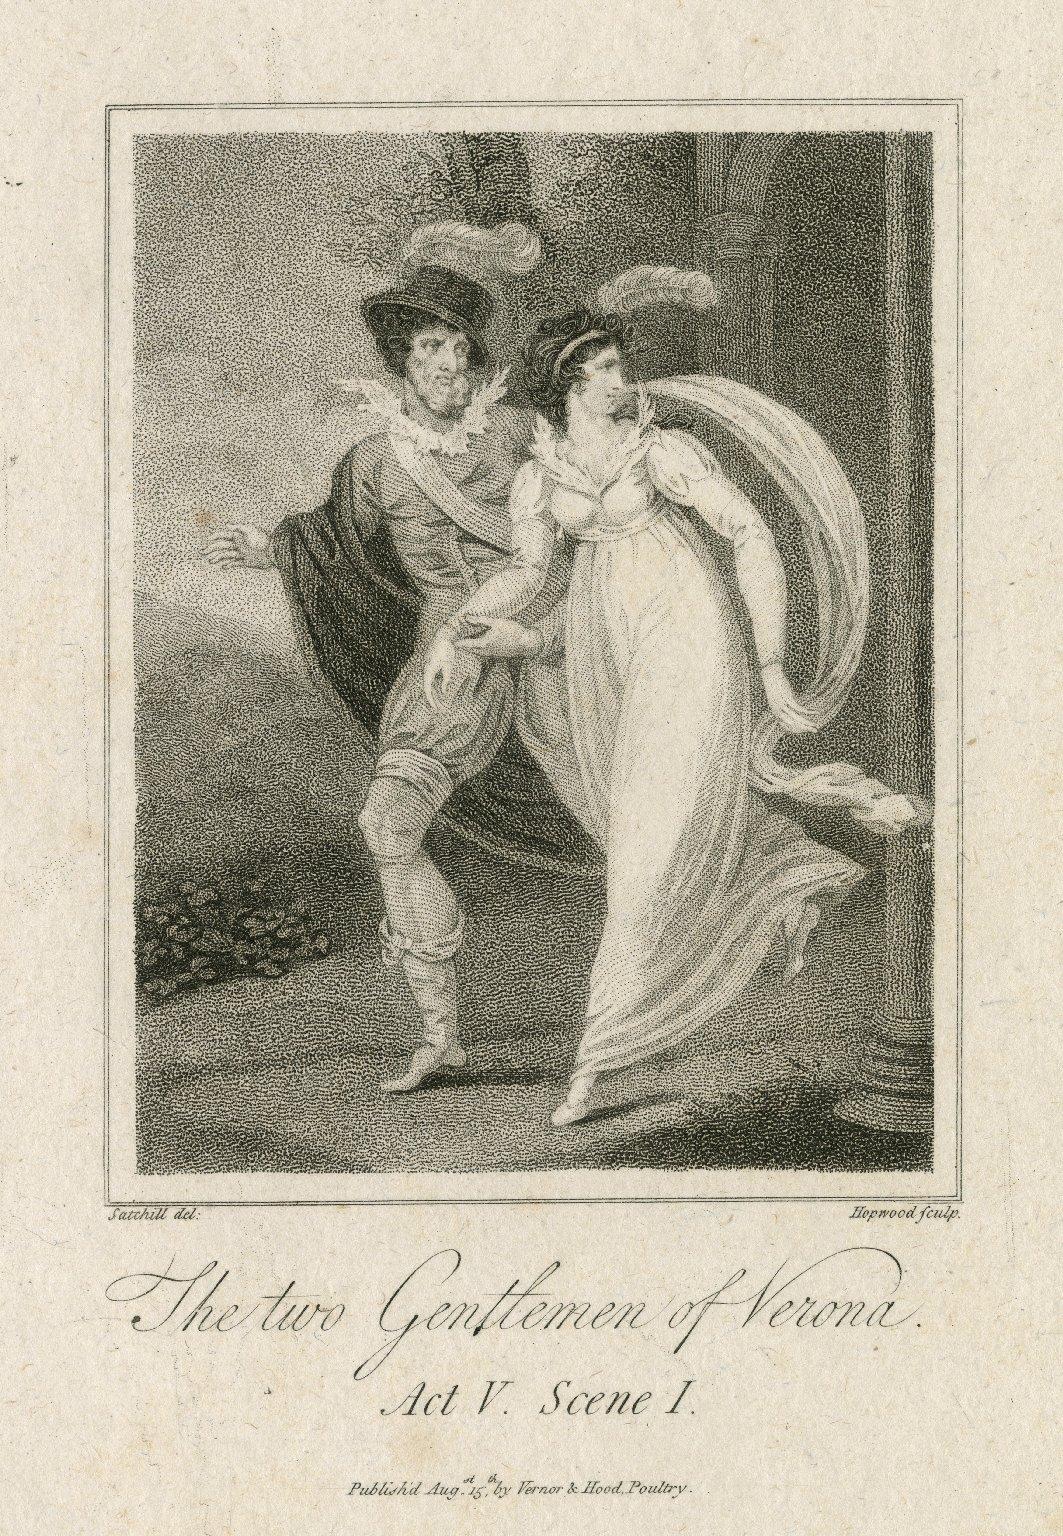 The two gentlemen of Verona, act V, scene I [graphic] / Satchwell del. ; Hopwood sculp.